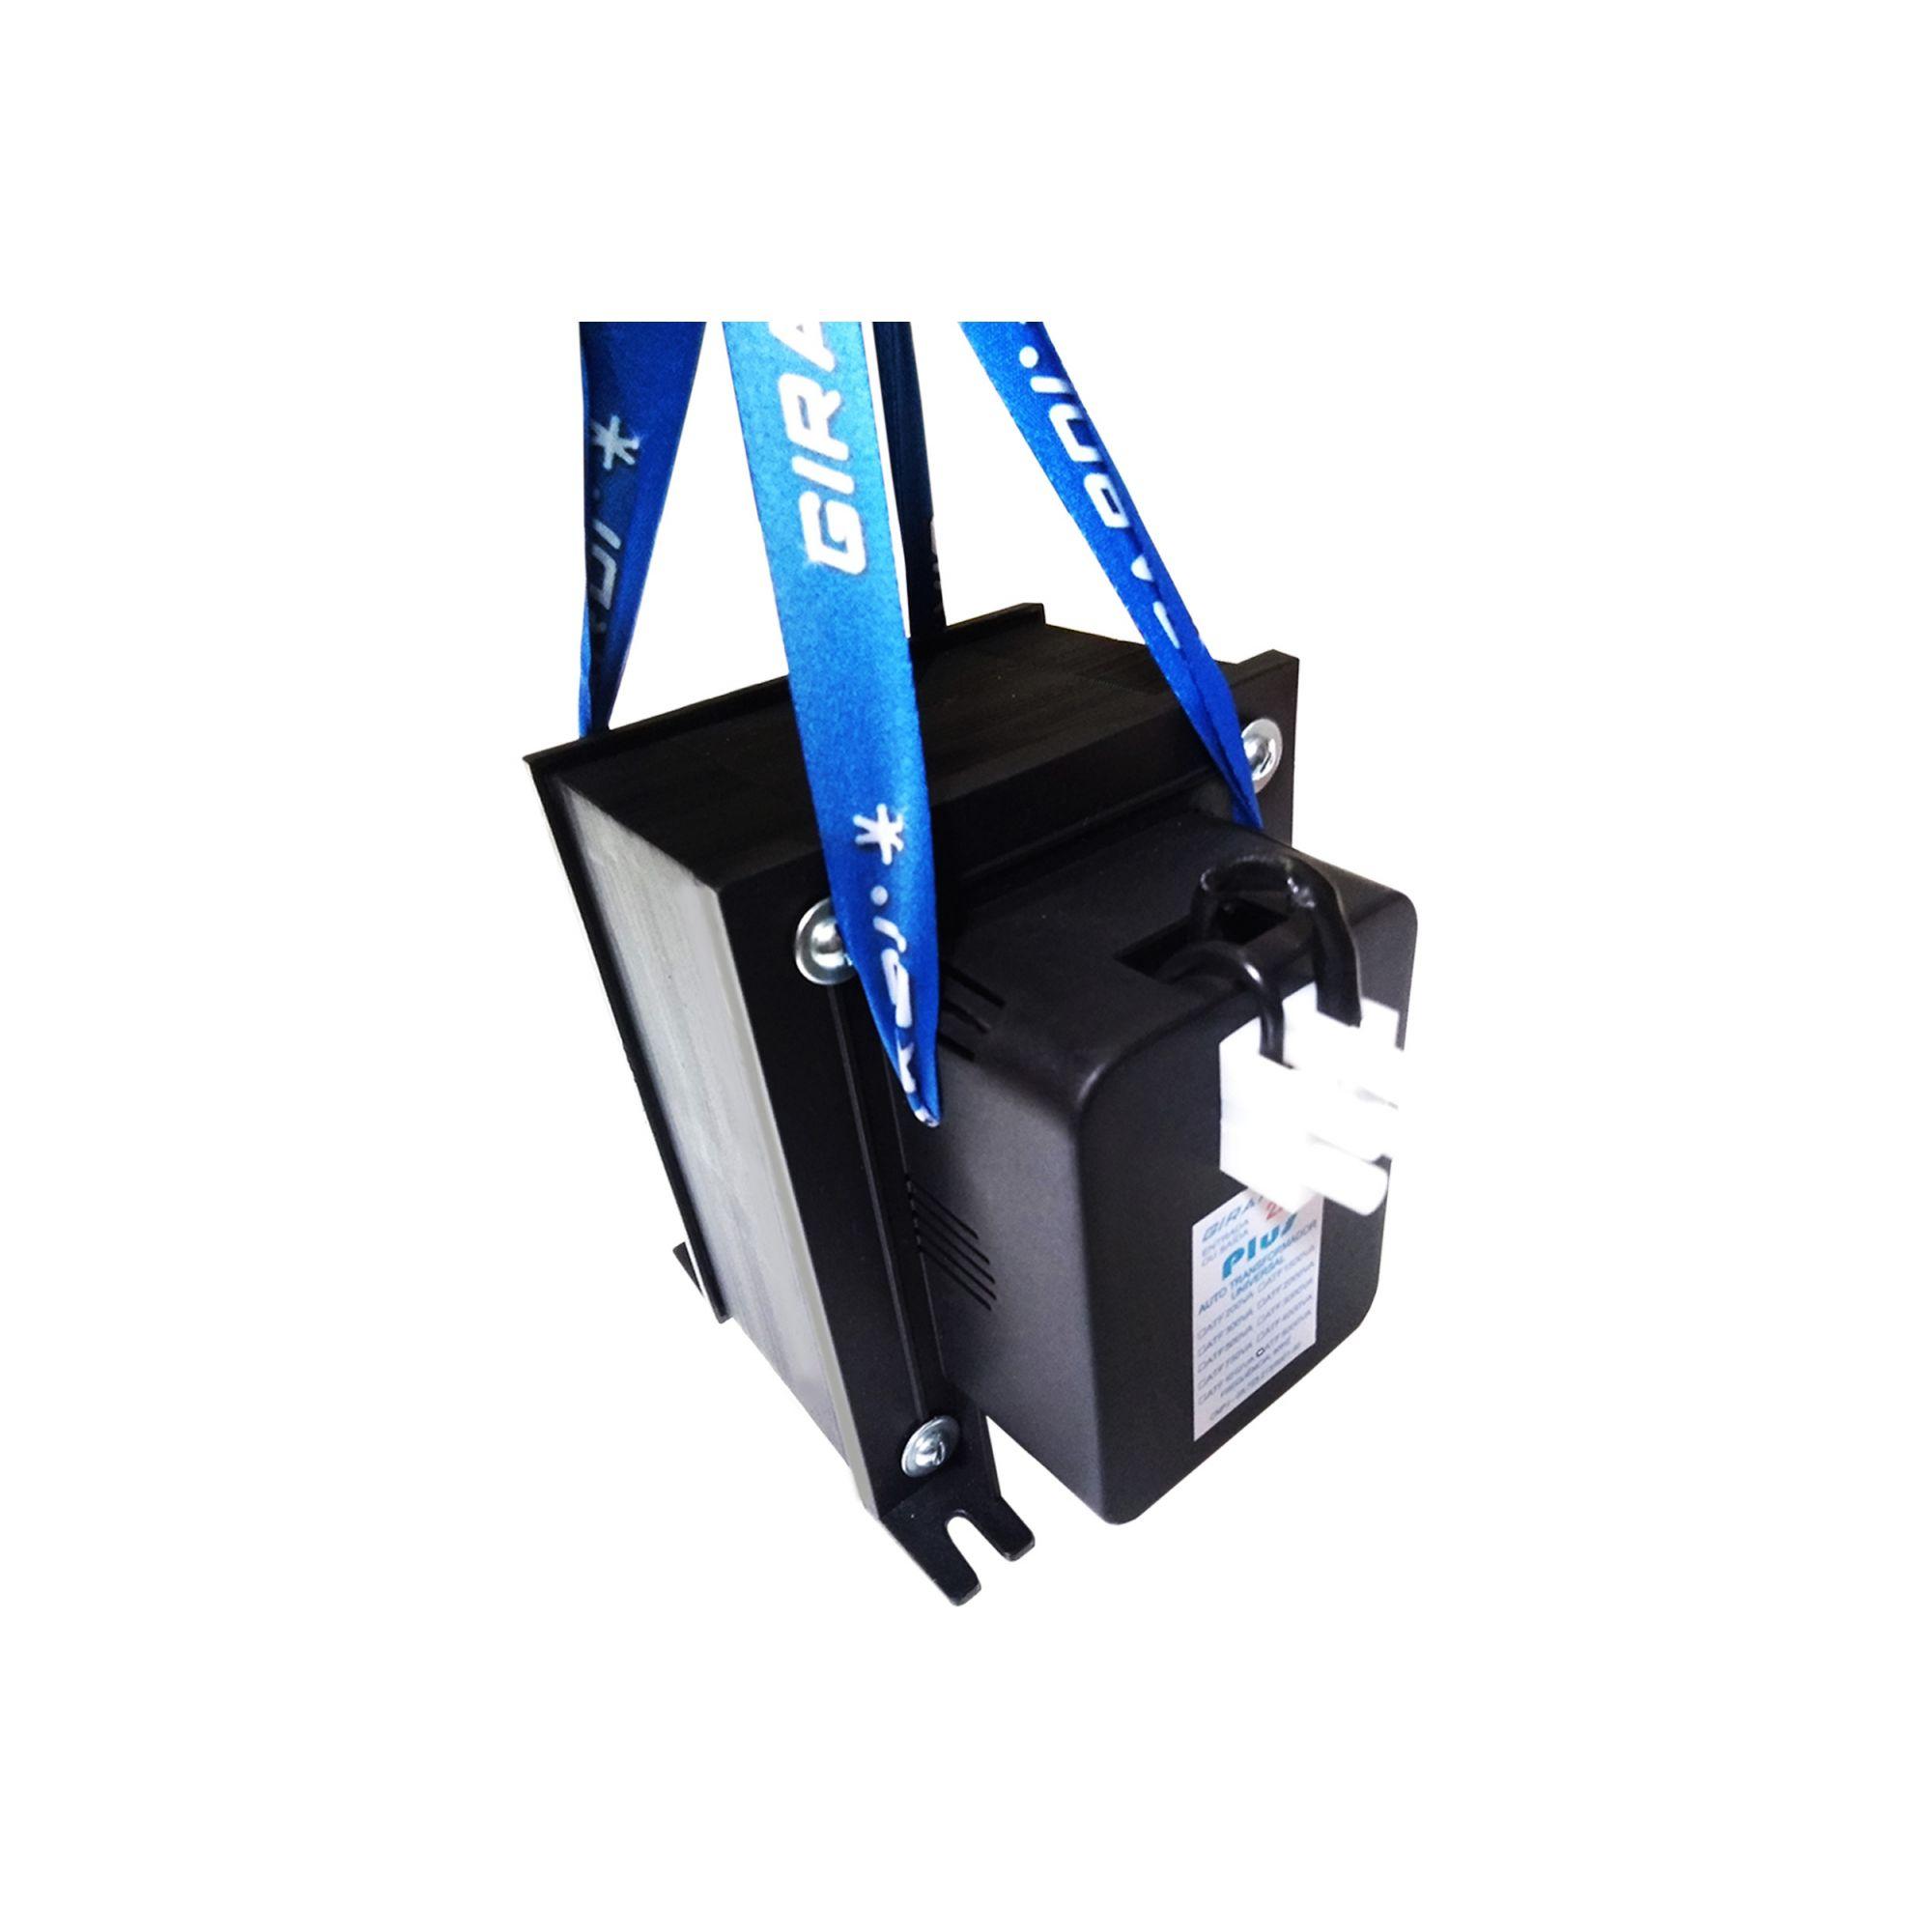 Auto Transformador Conversor Bivolt 110 / 127 e 220 V  4000 VA Girardi Plus